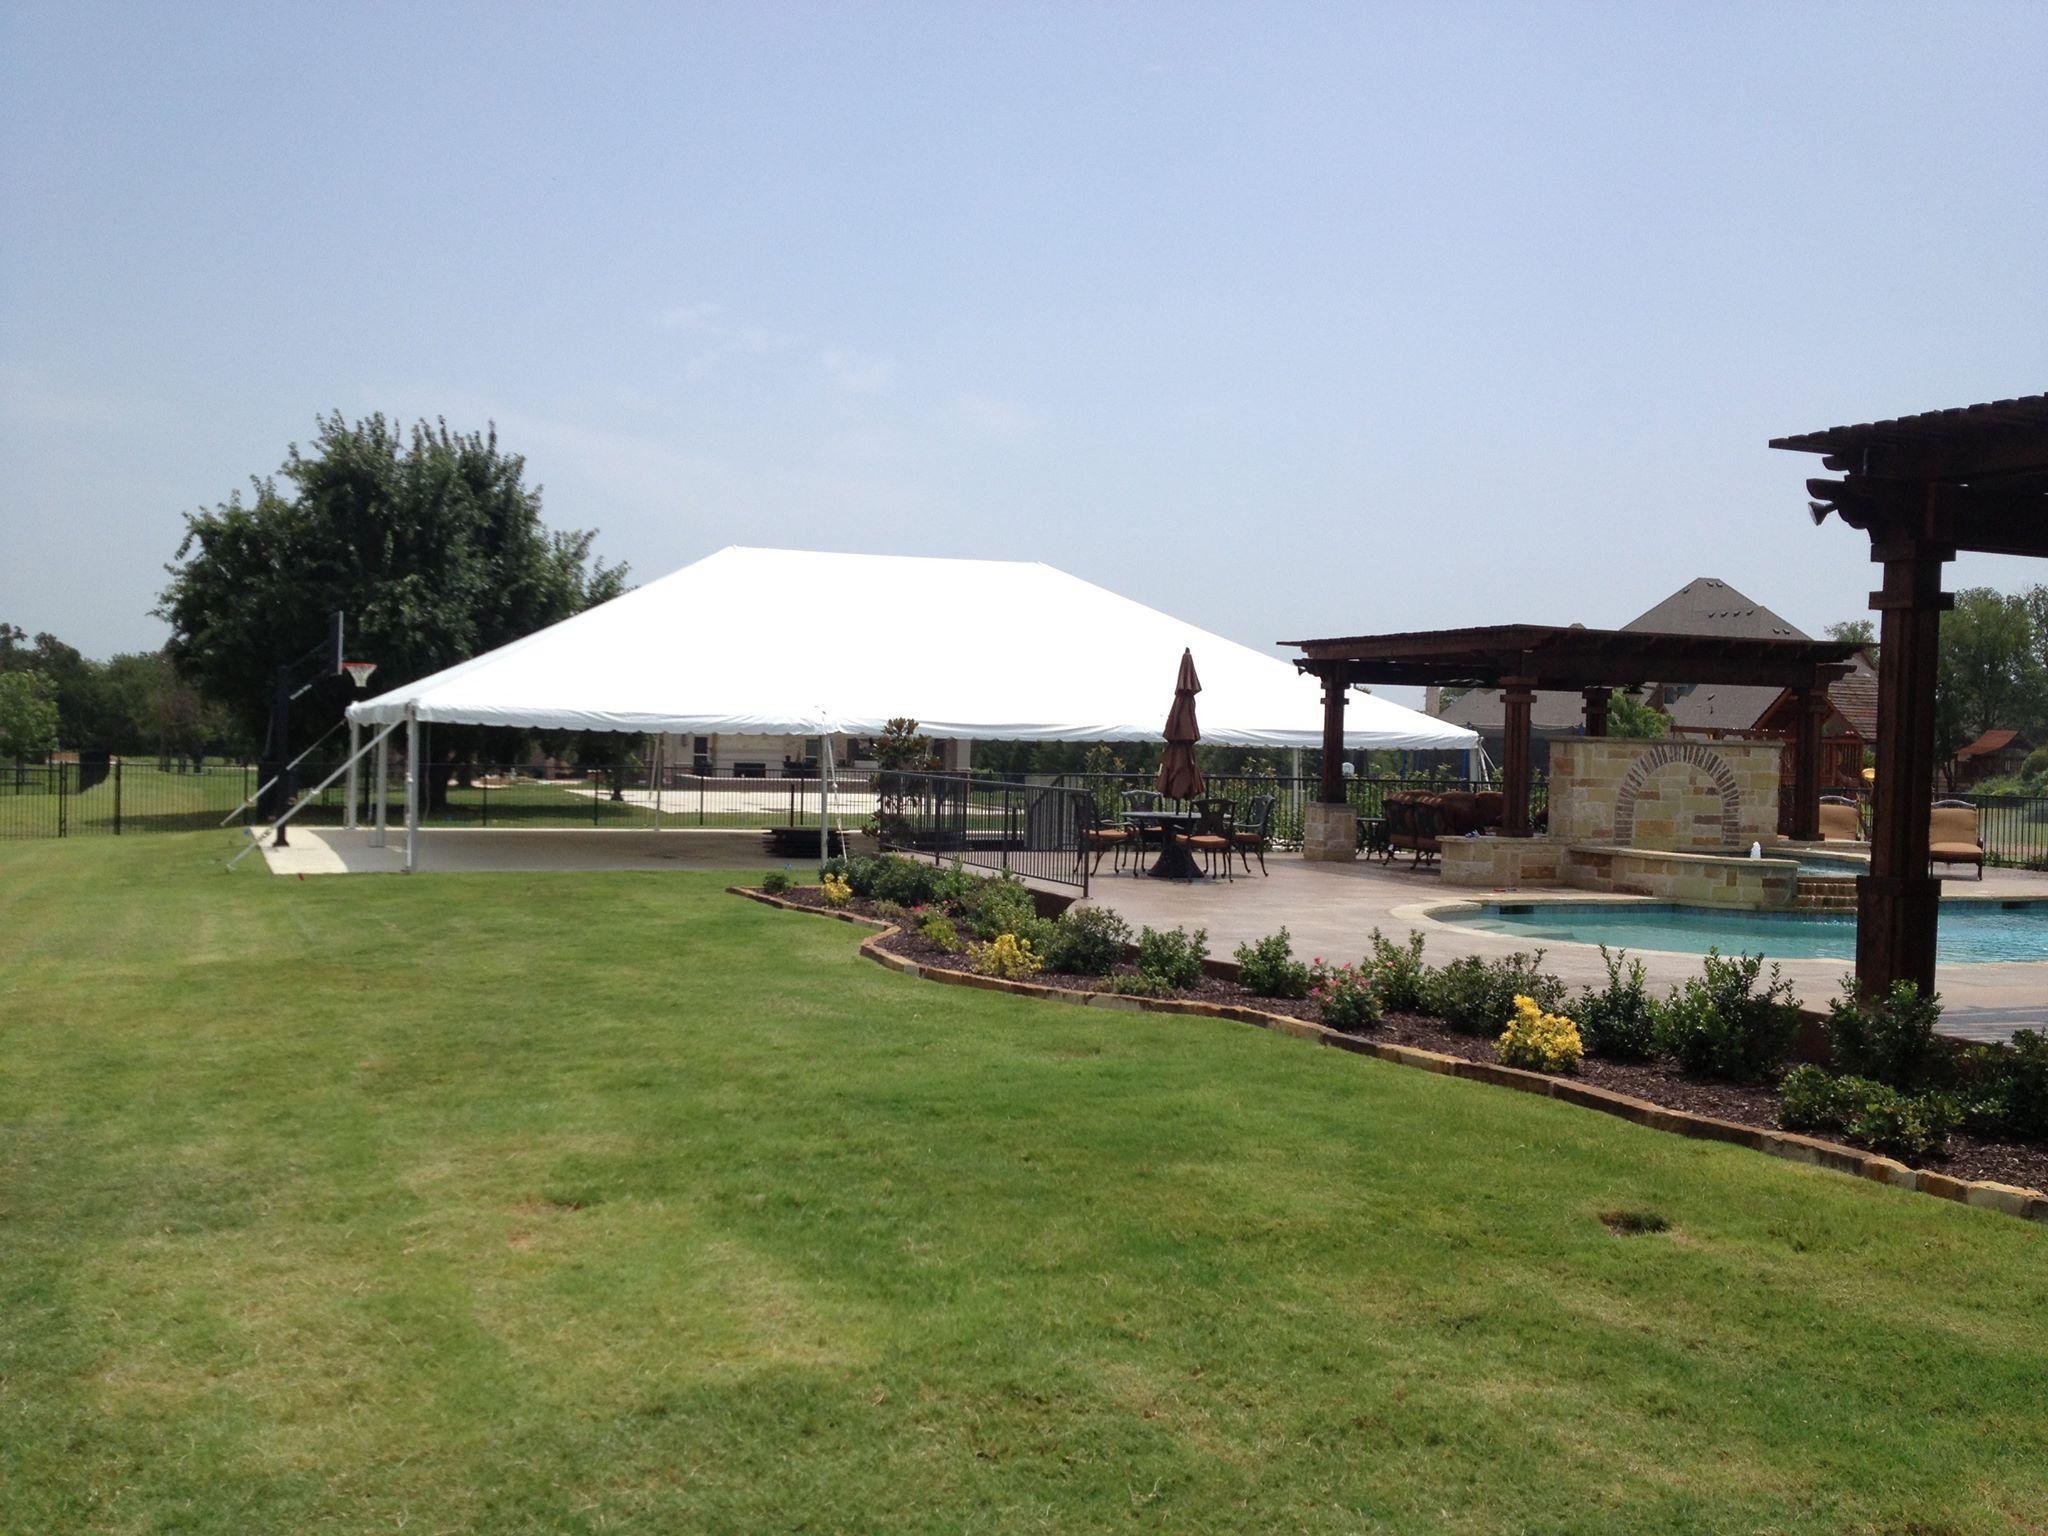 40x60 Frame Tent